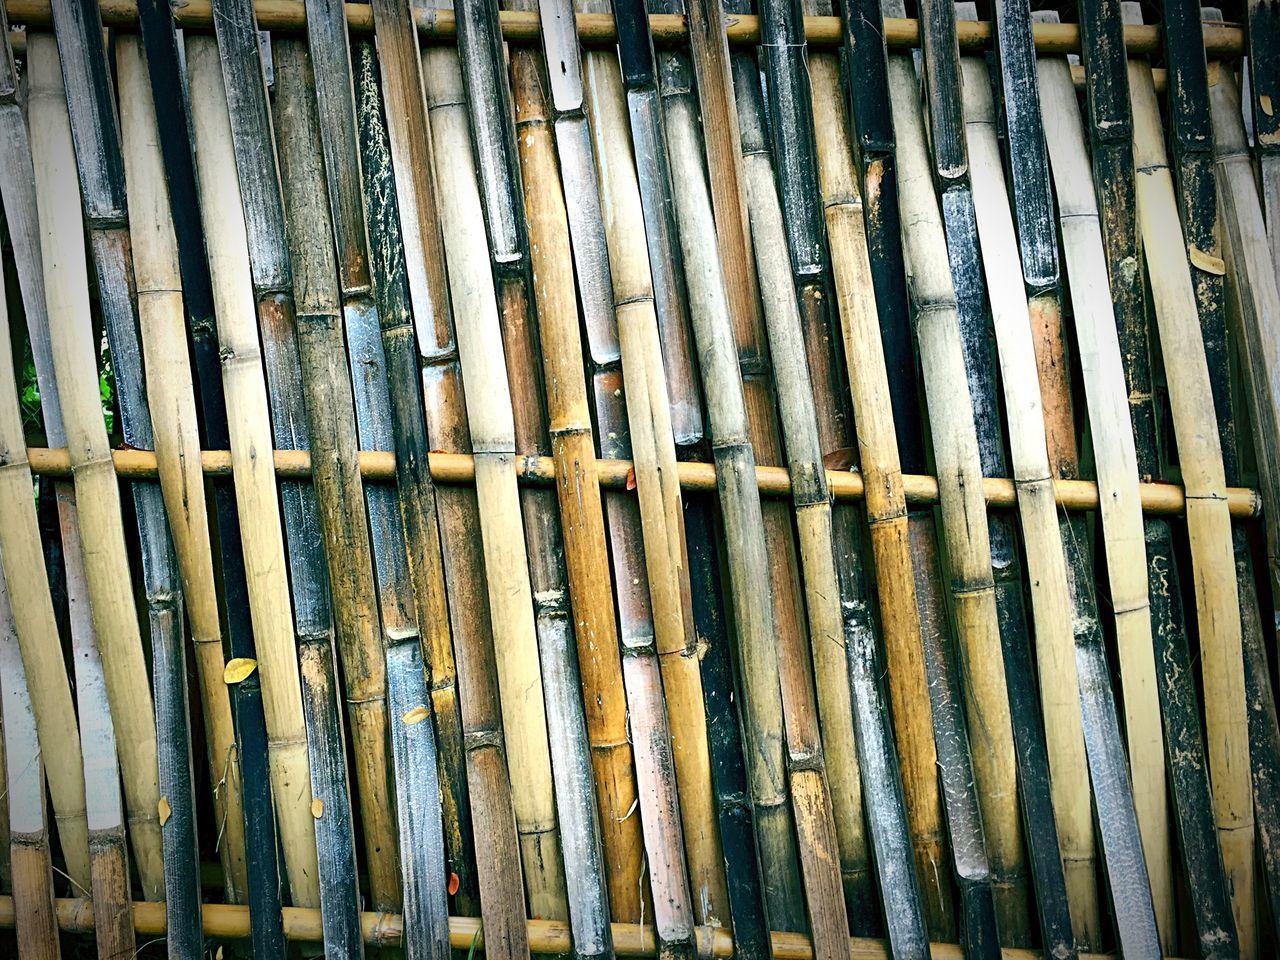 Bamboo Bamboo Art Hello World Taking Photos Capture The Moment Snapshots Of Life Photography Nature Bamboo Fence